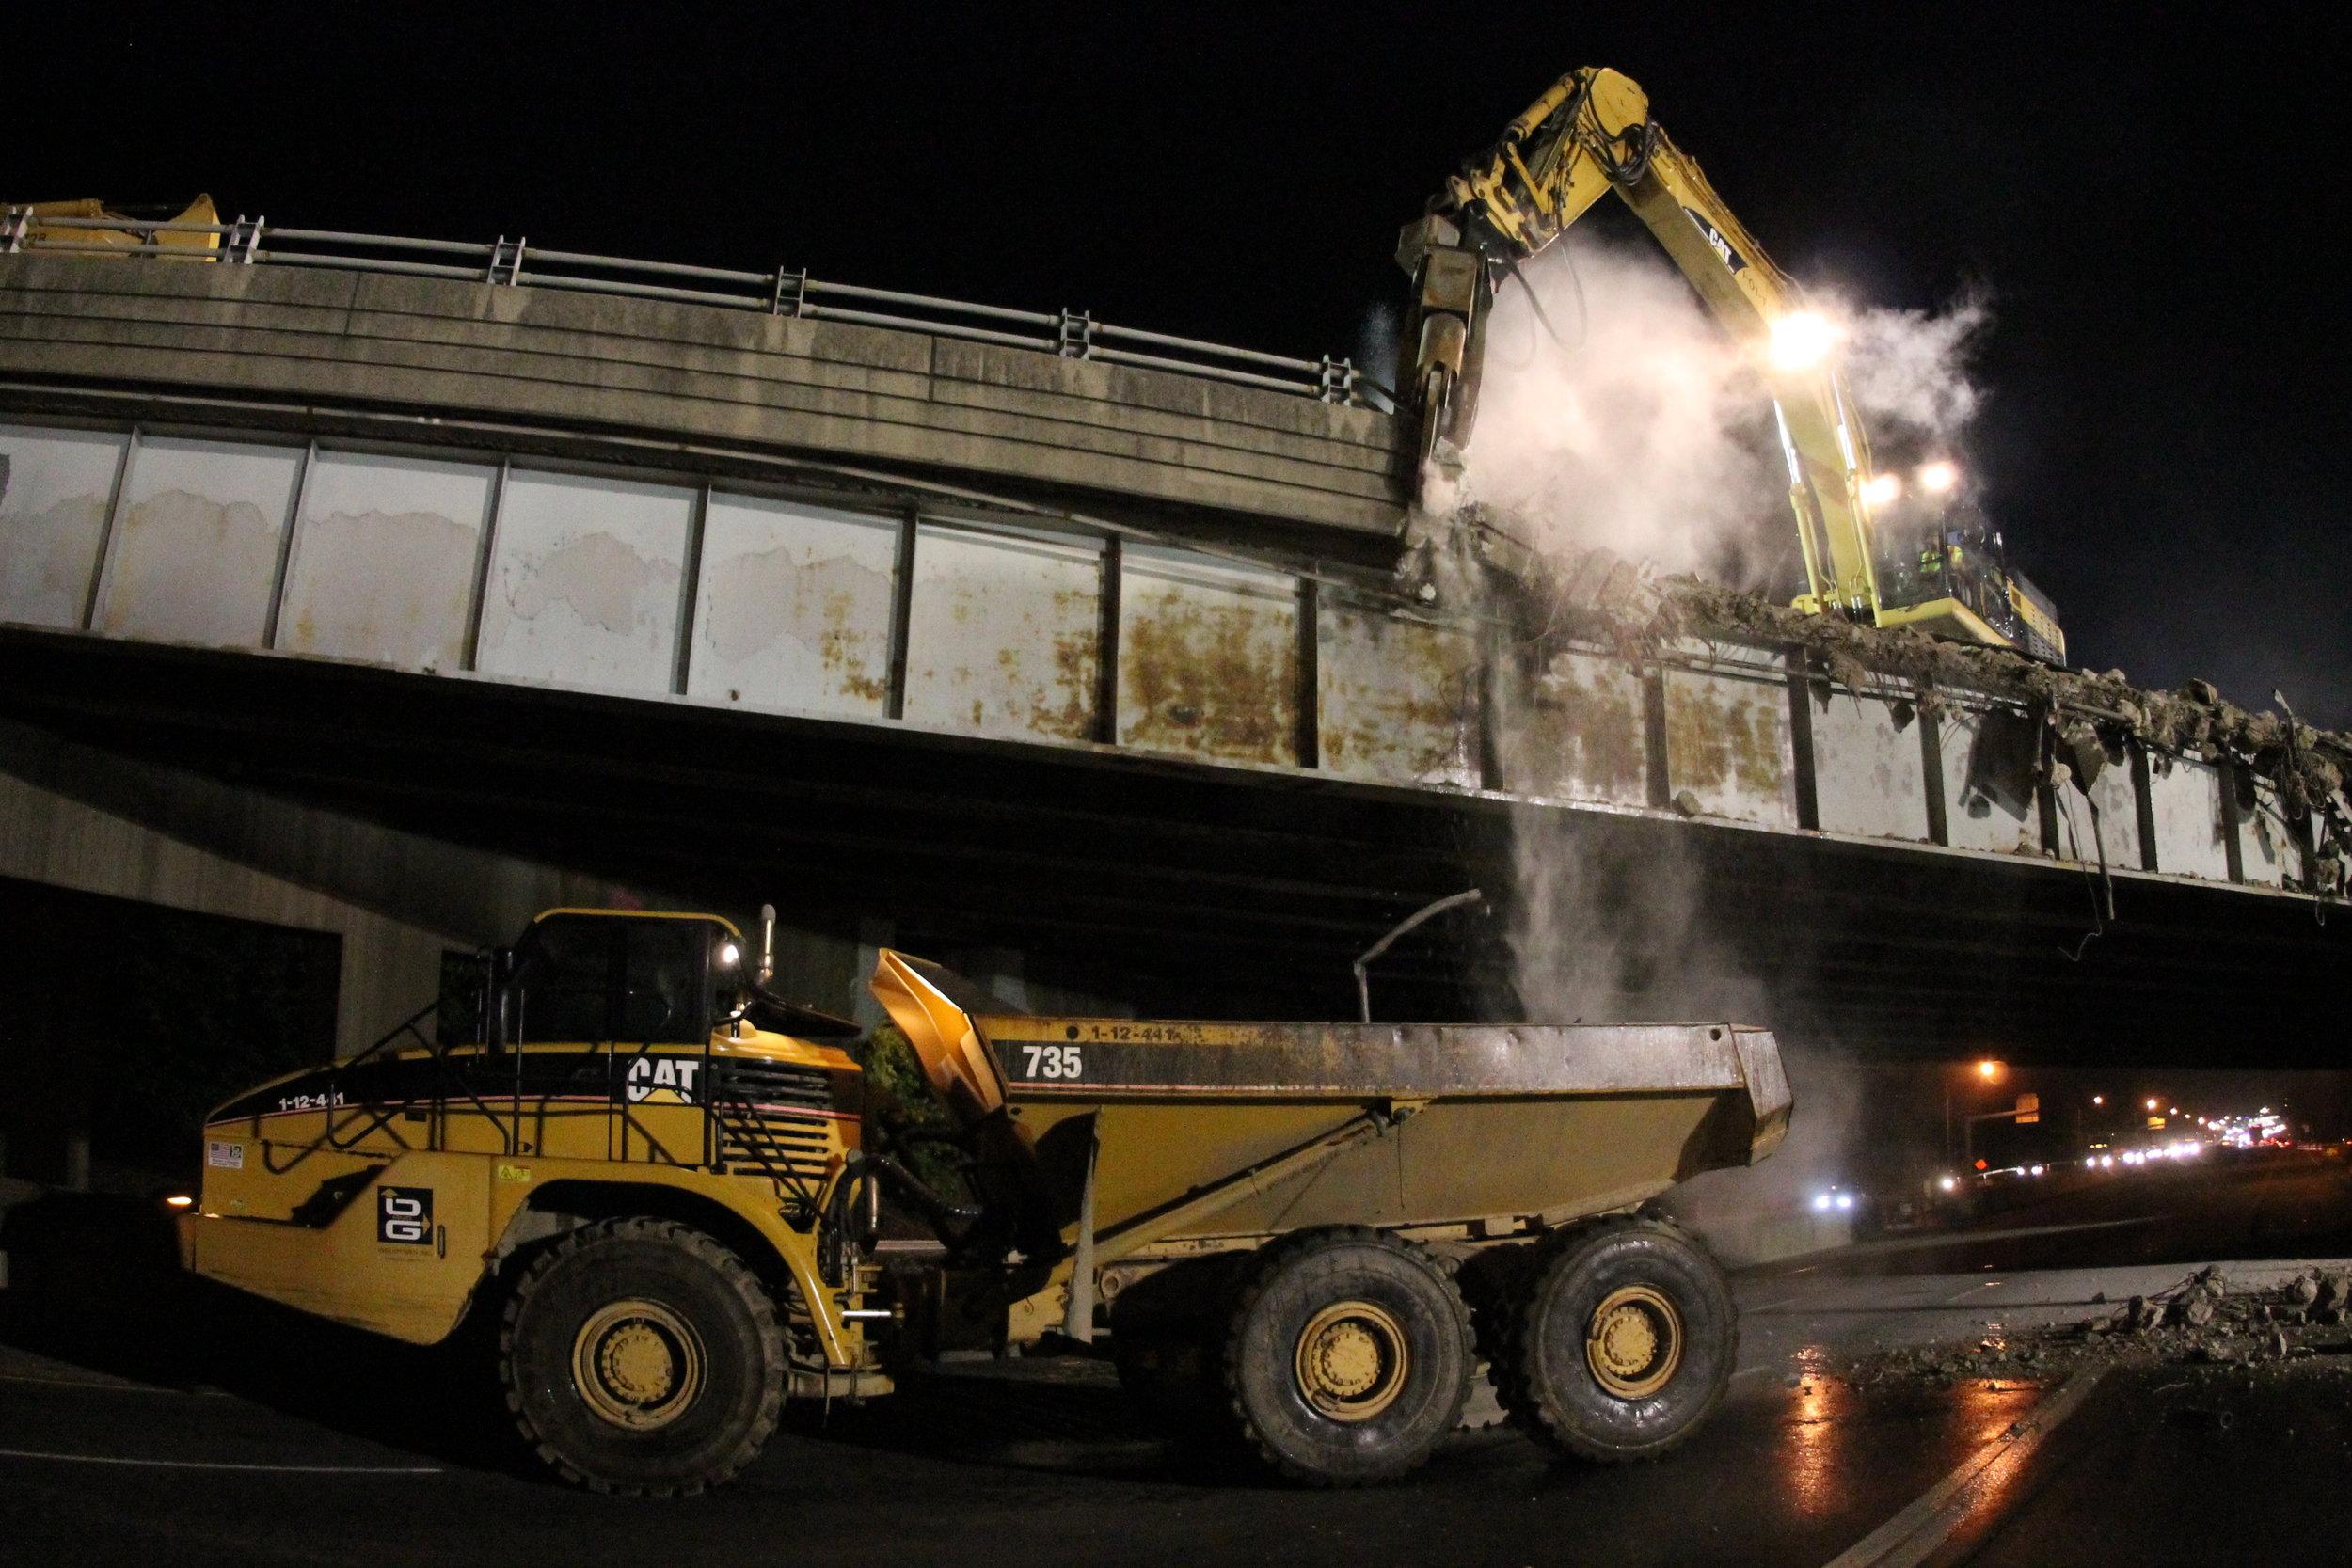 Parapet removal from bridge sidewalk.  Taken on night of 5/31/19 by Pete Venoutsos